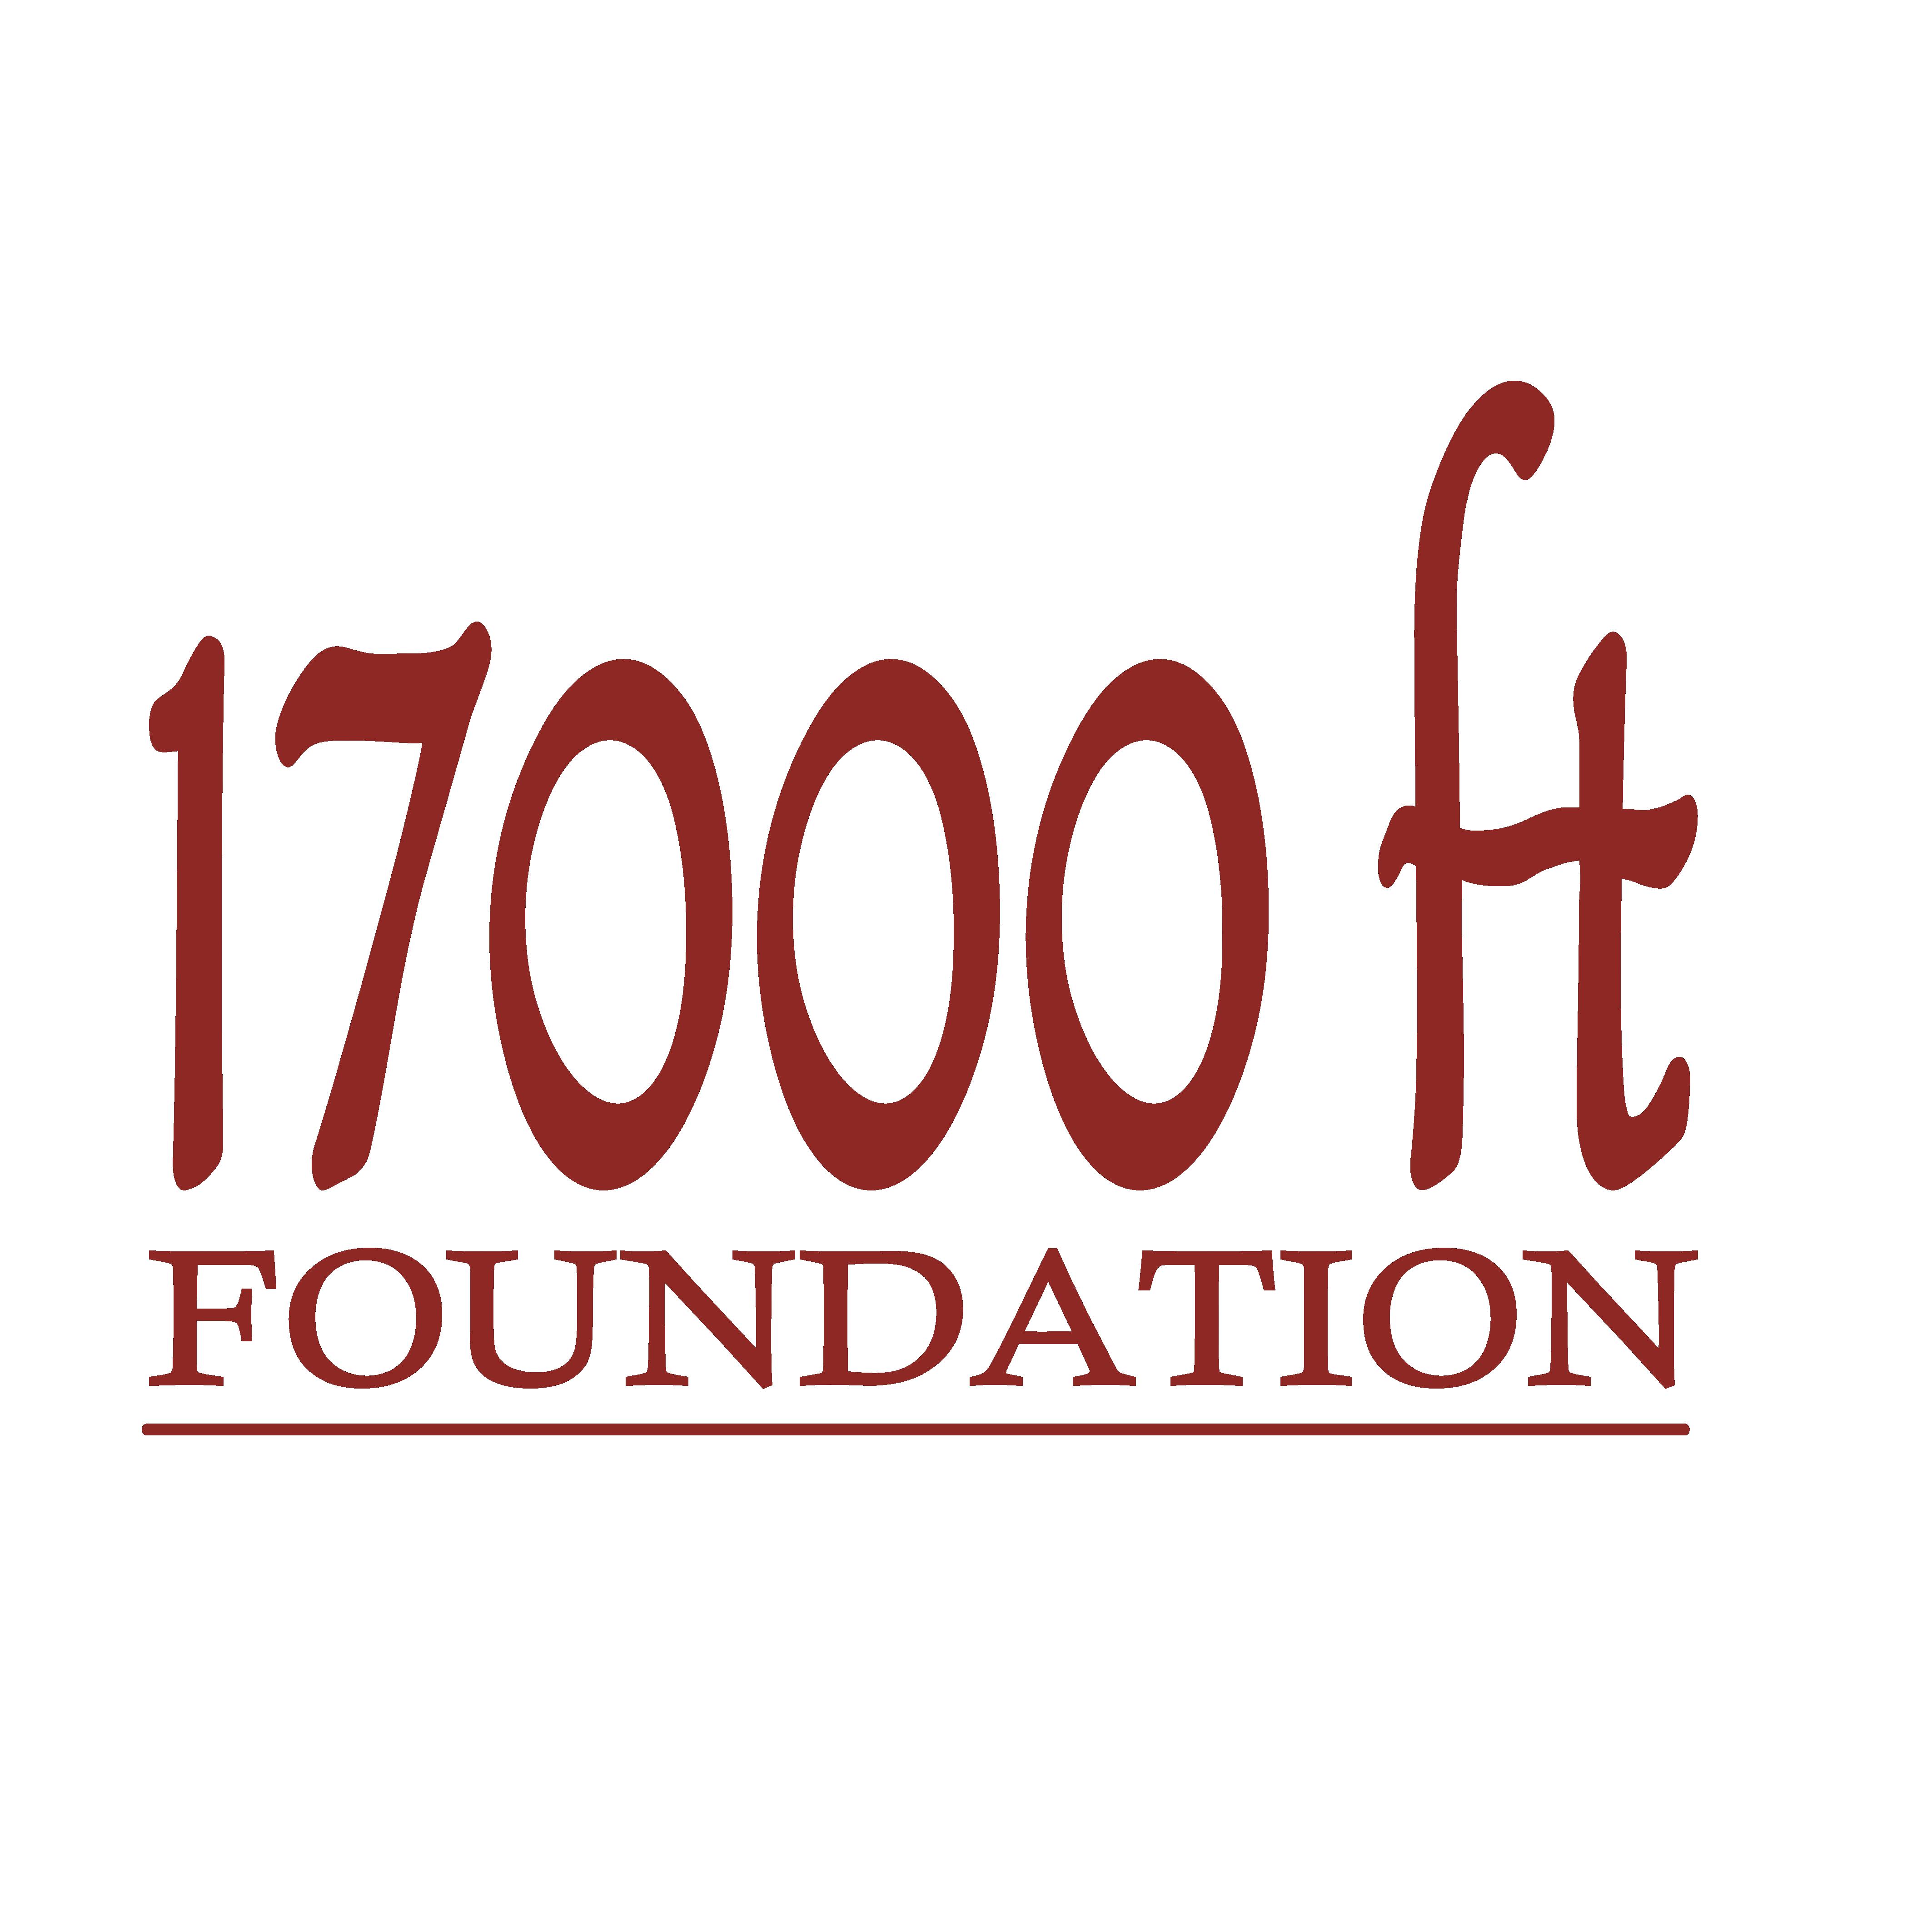 17000 ft Foundation